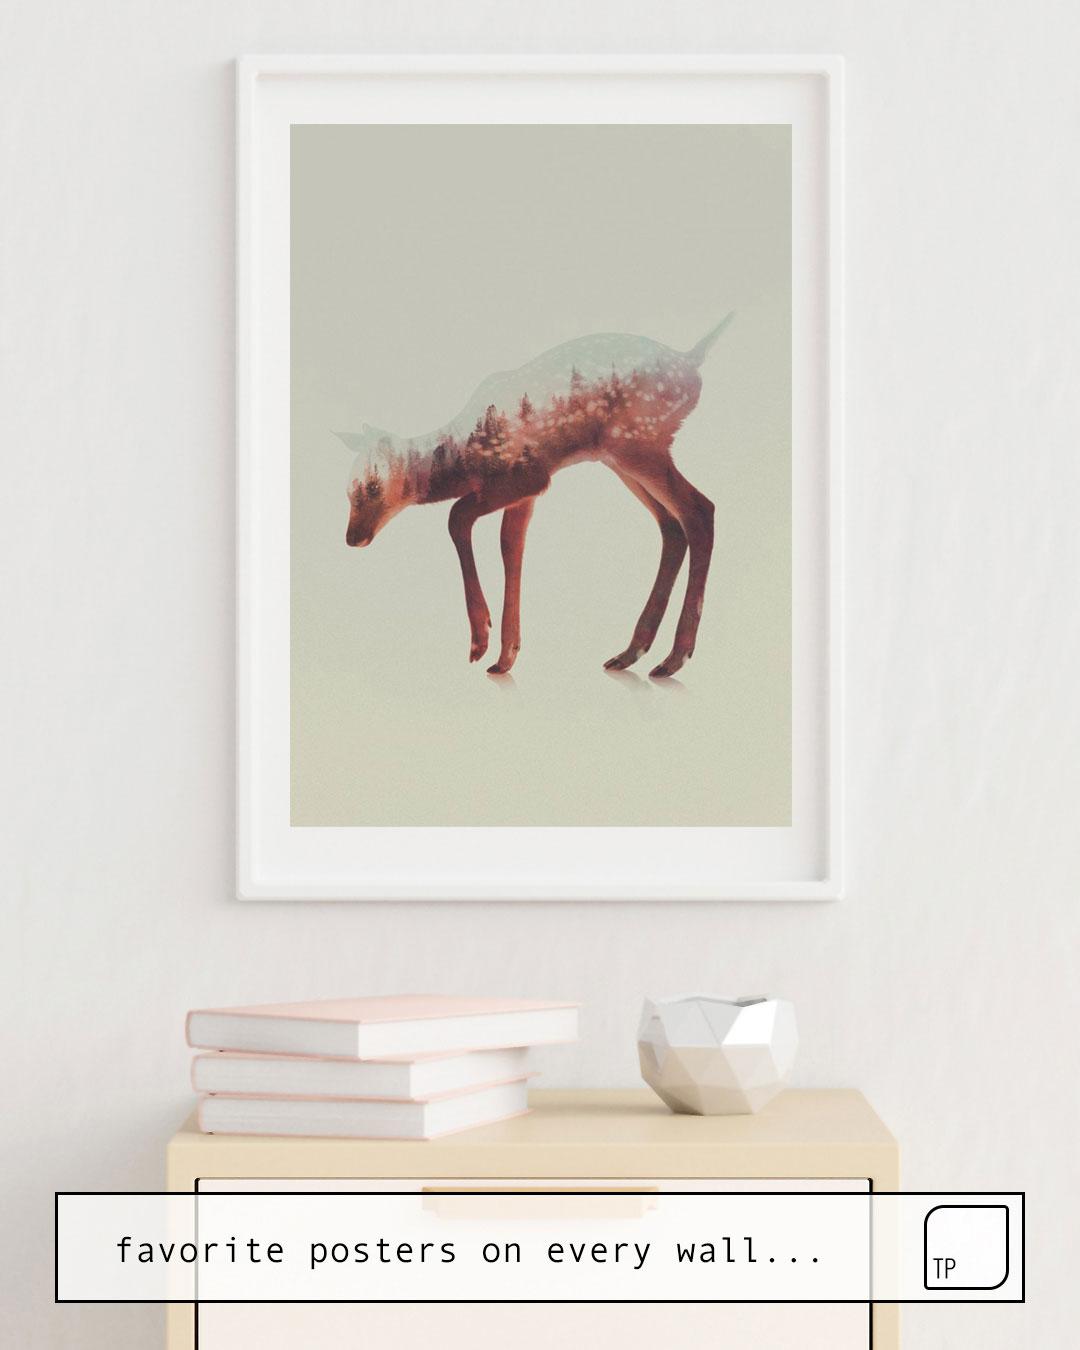 Poster | NORWEGIAN WOODS: THE DEER by Andreas Lie